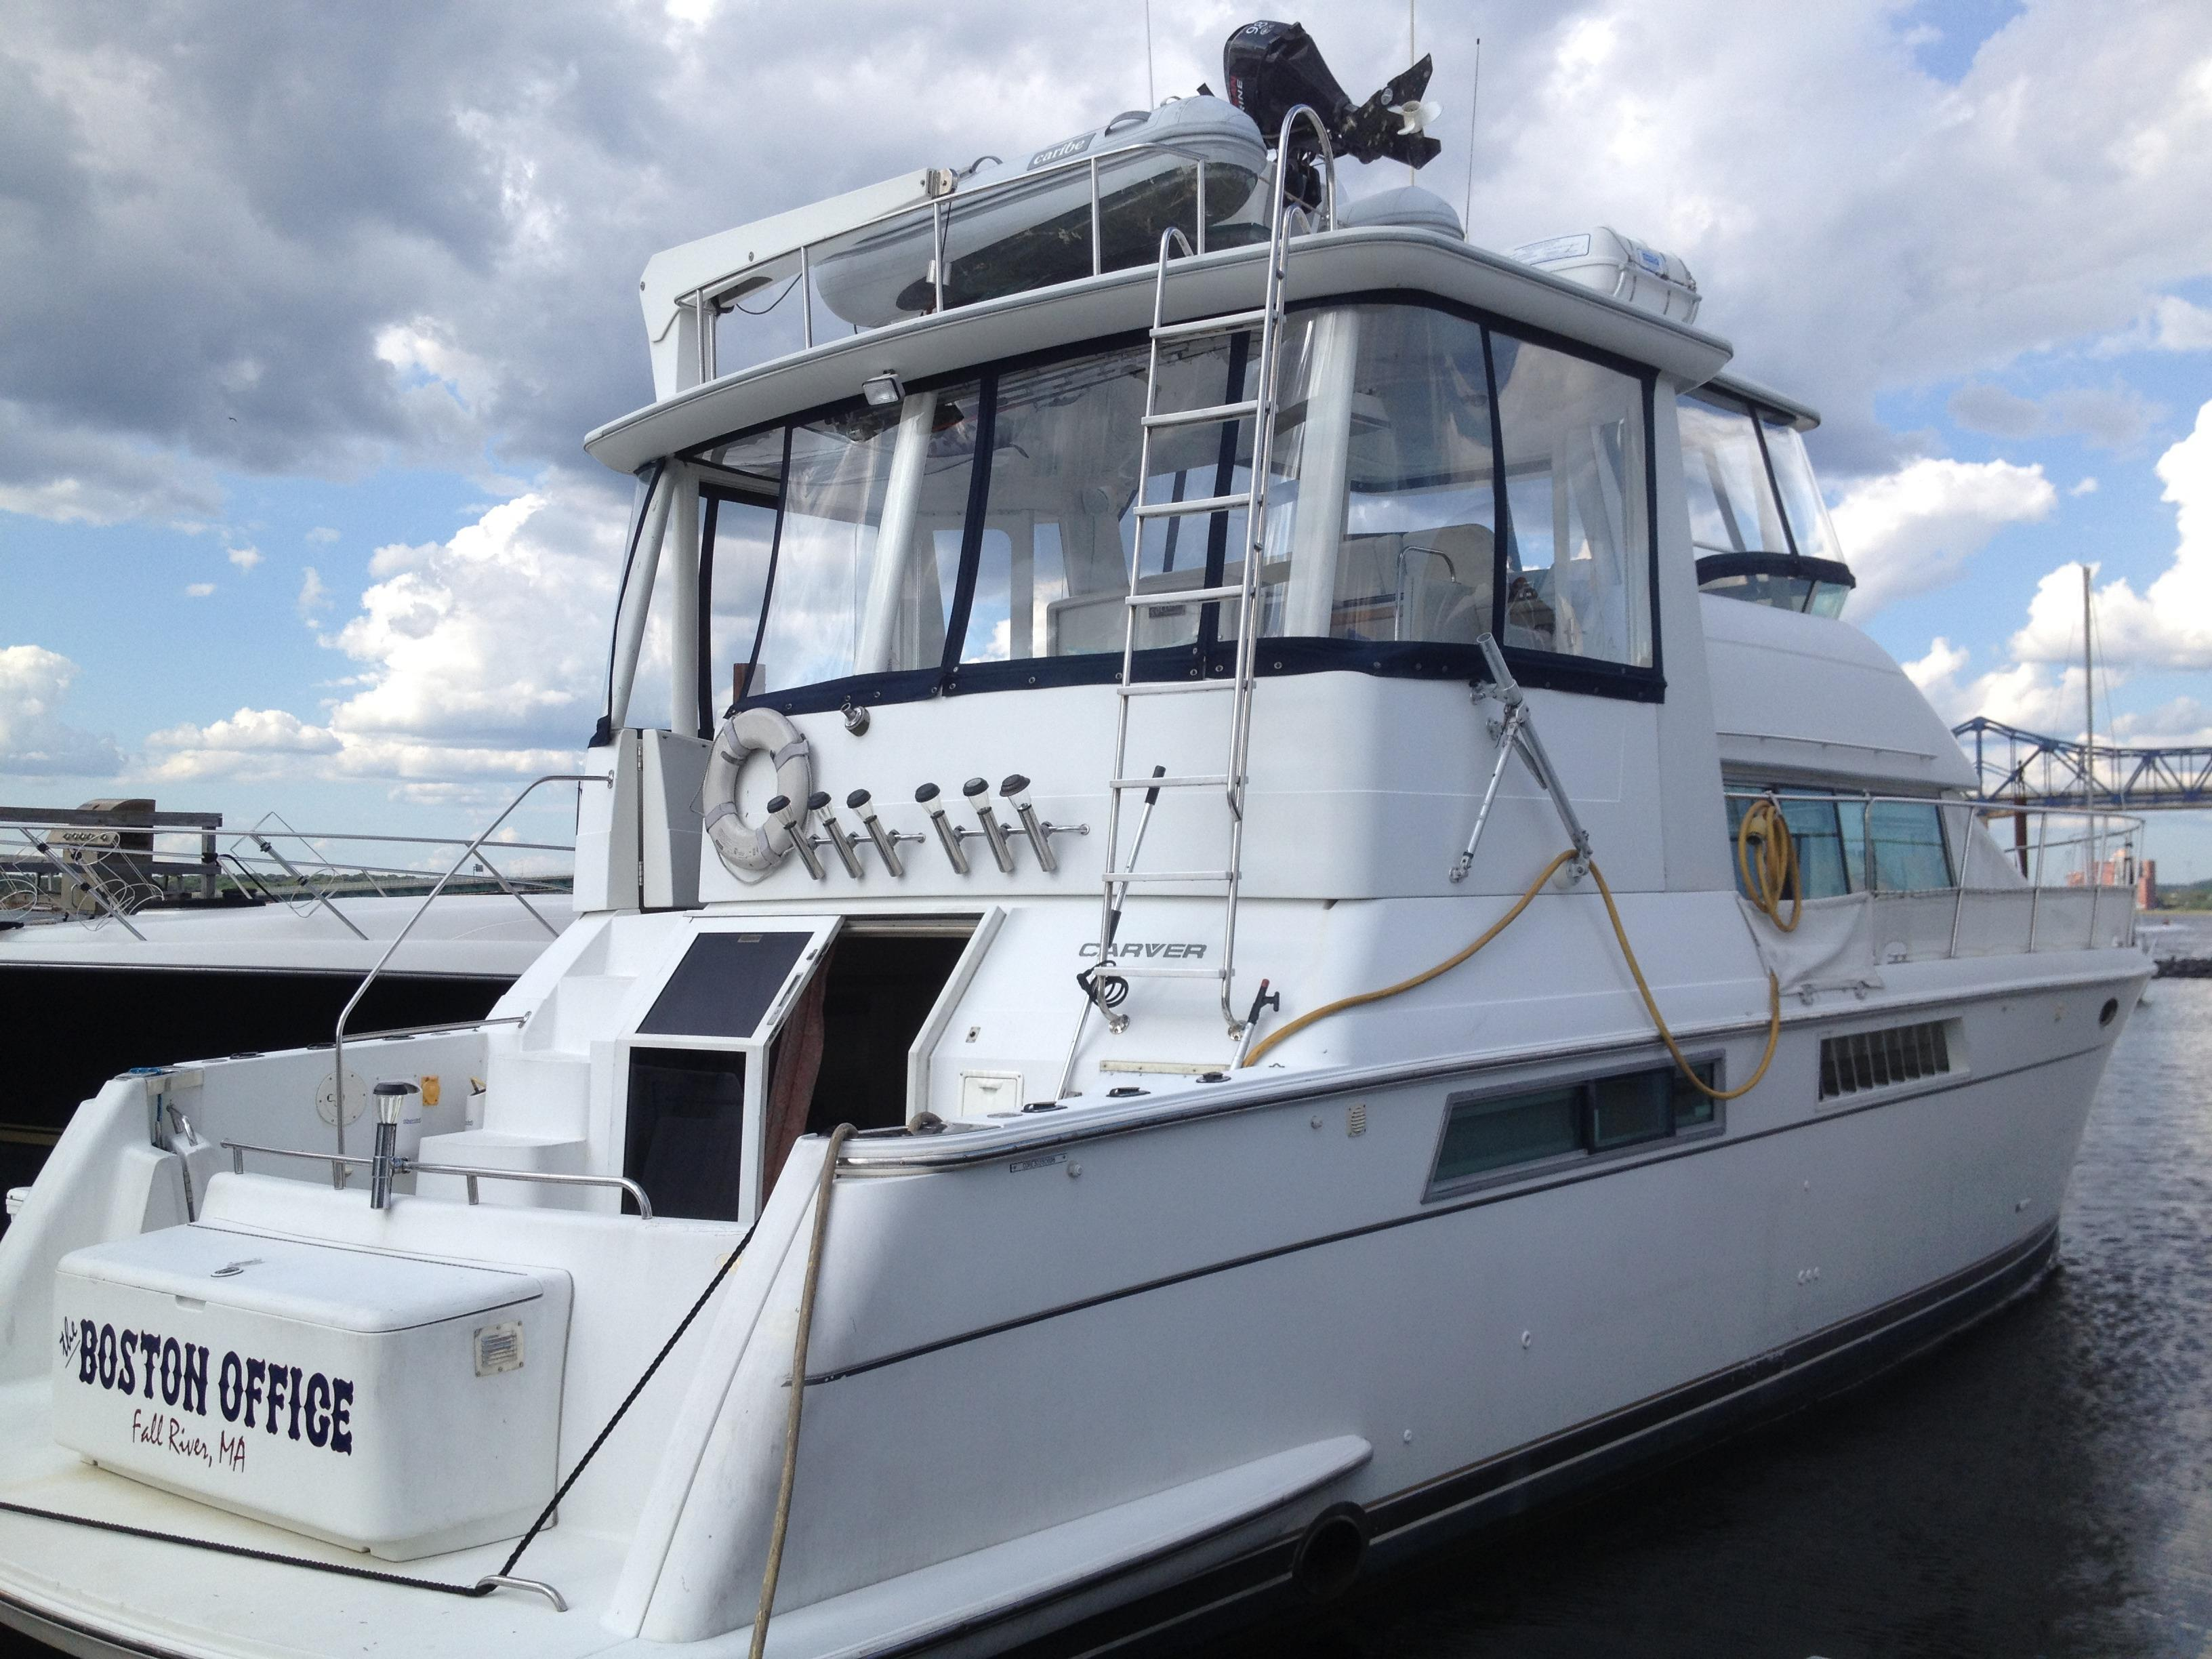 1996 carver 500 cockpit motor yacht for sale for 50 ft motor yachts for sale